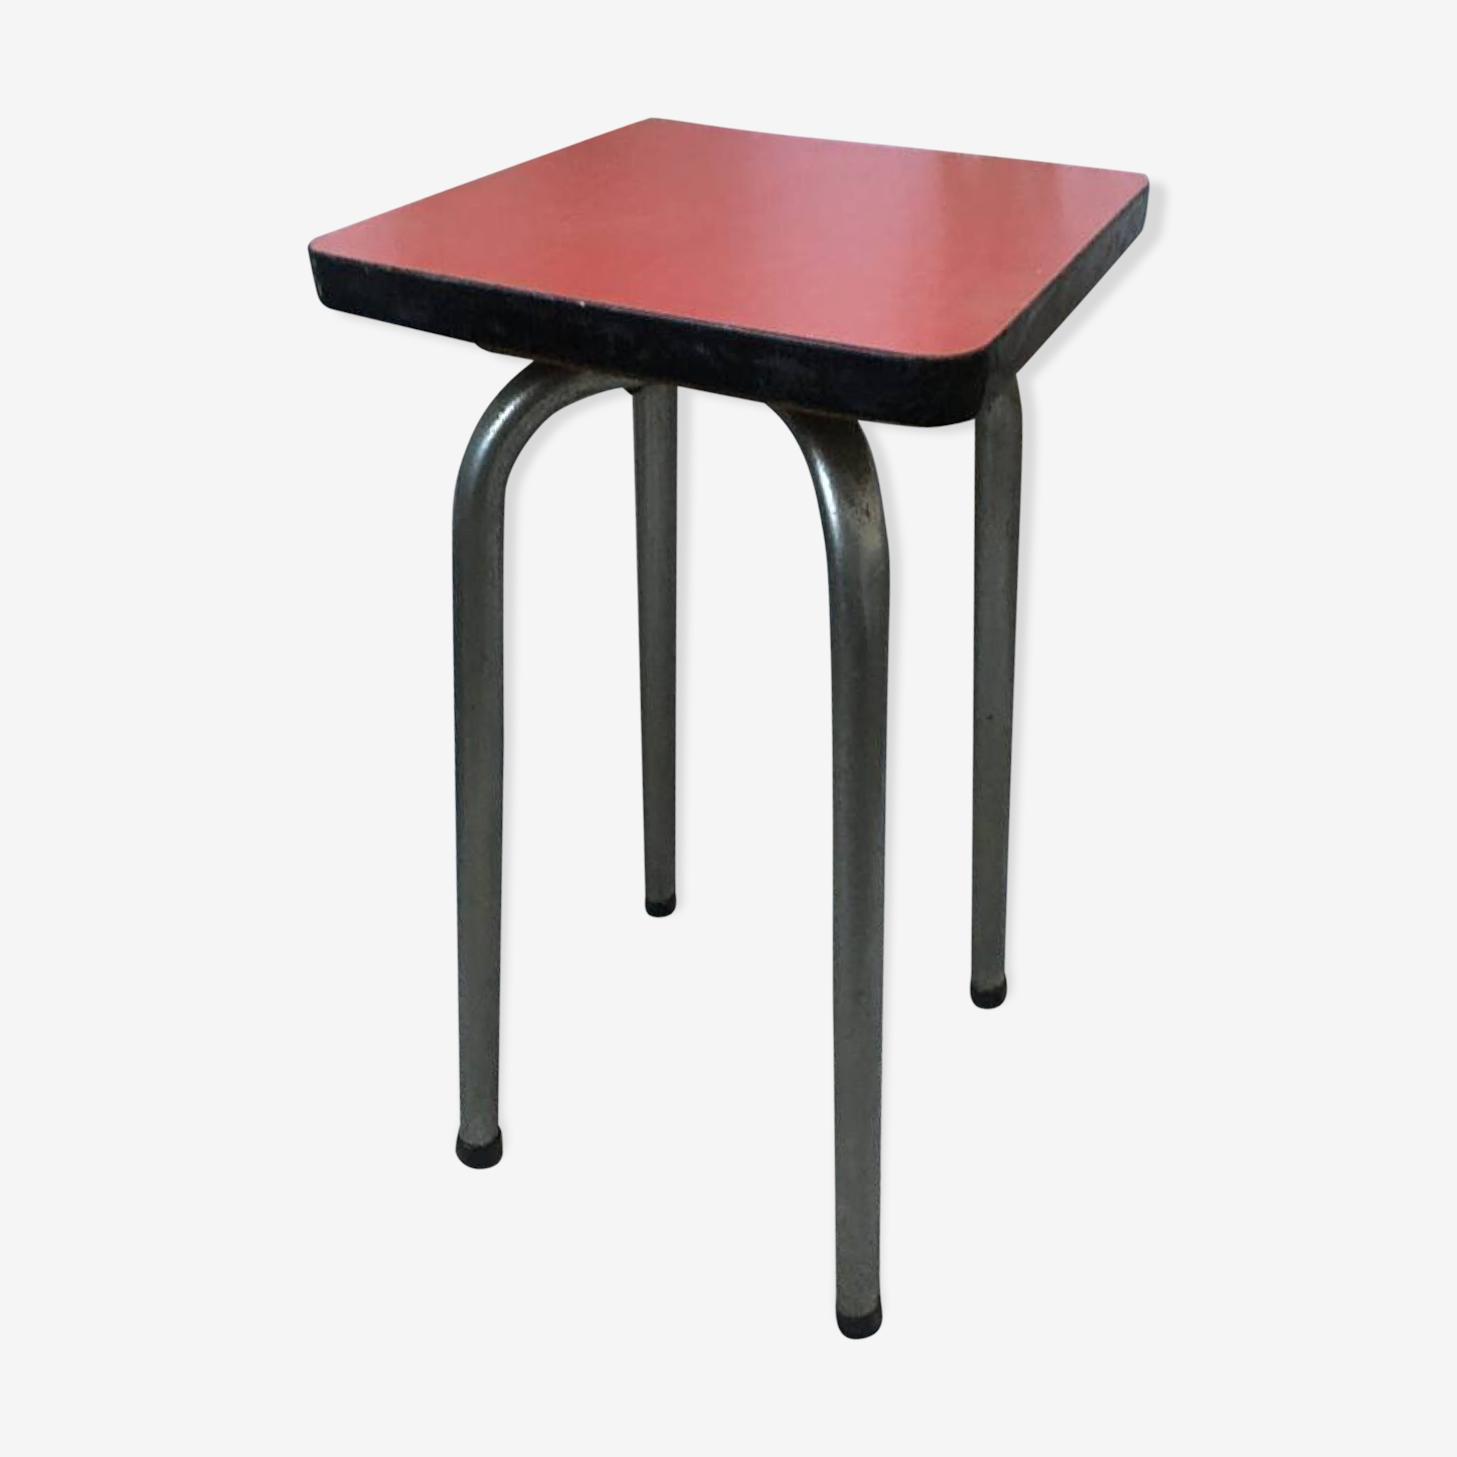 Tabouret formica rouge années 60